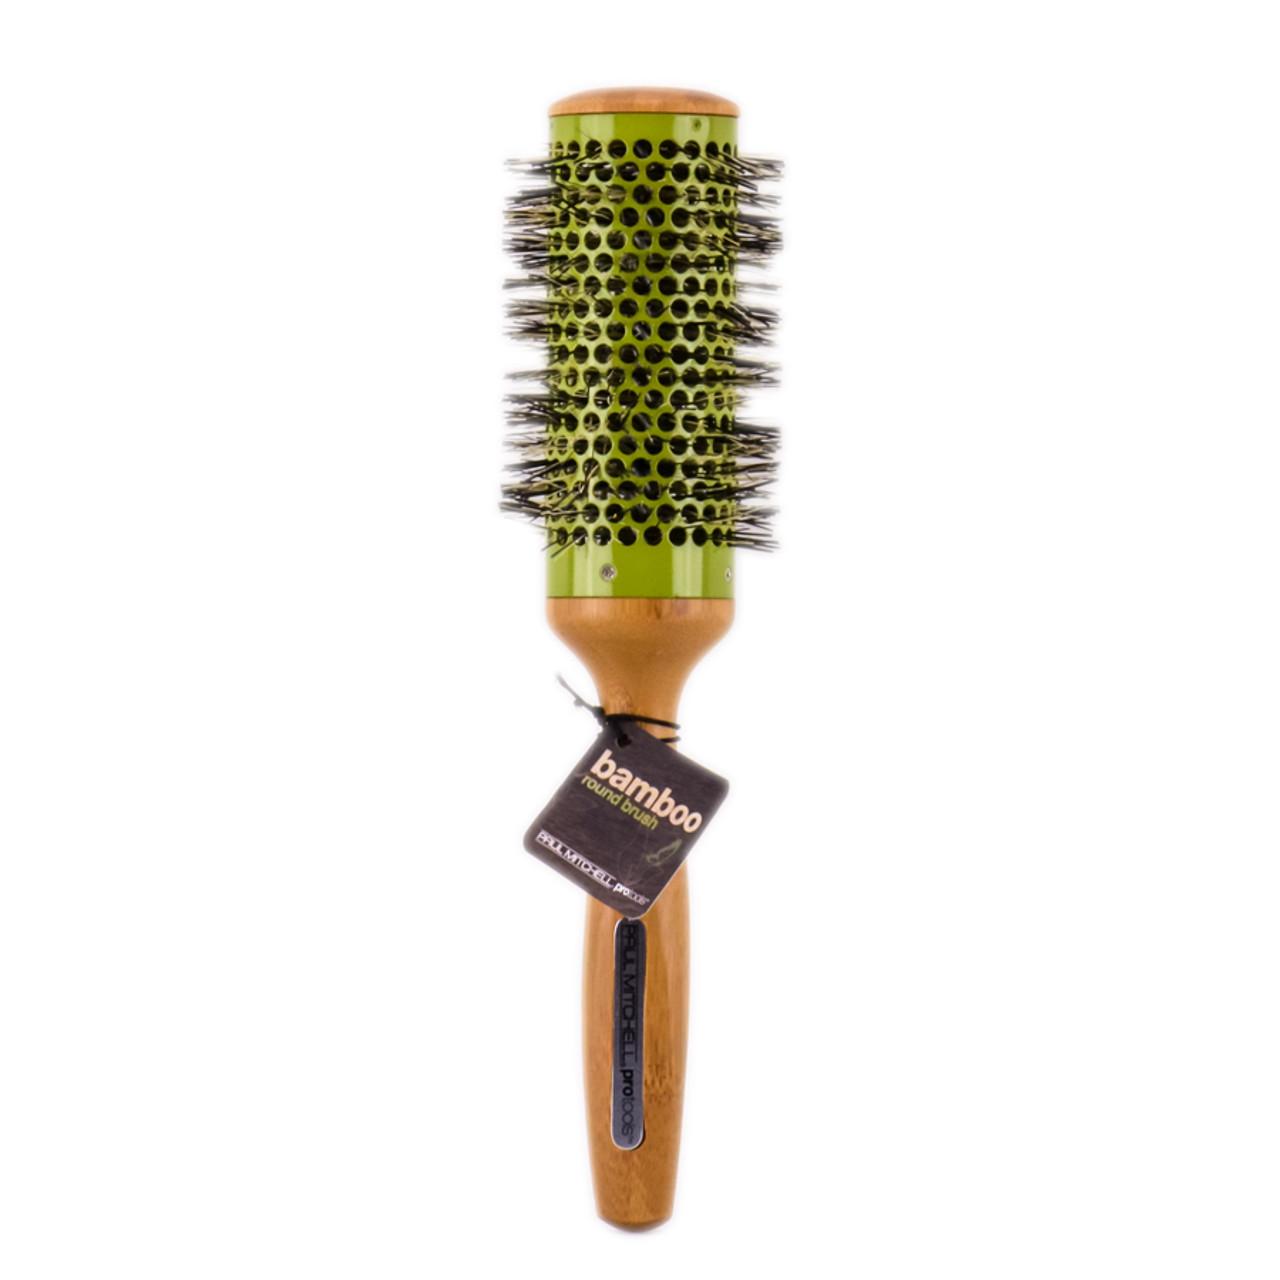 Paul Mitchell Pro-tools Bamboo Brush